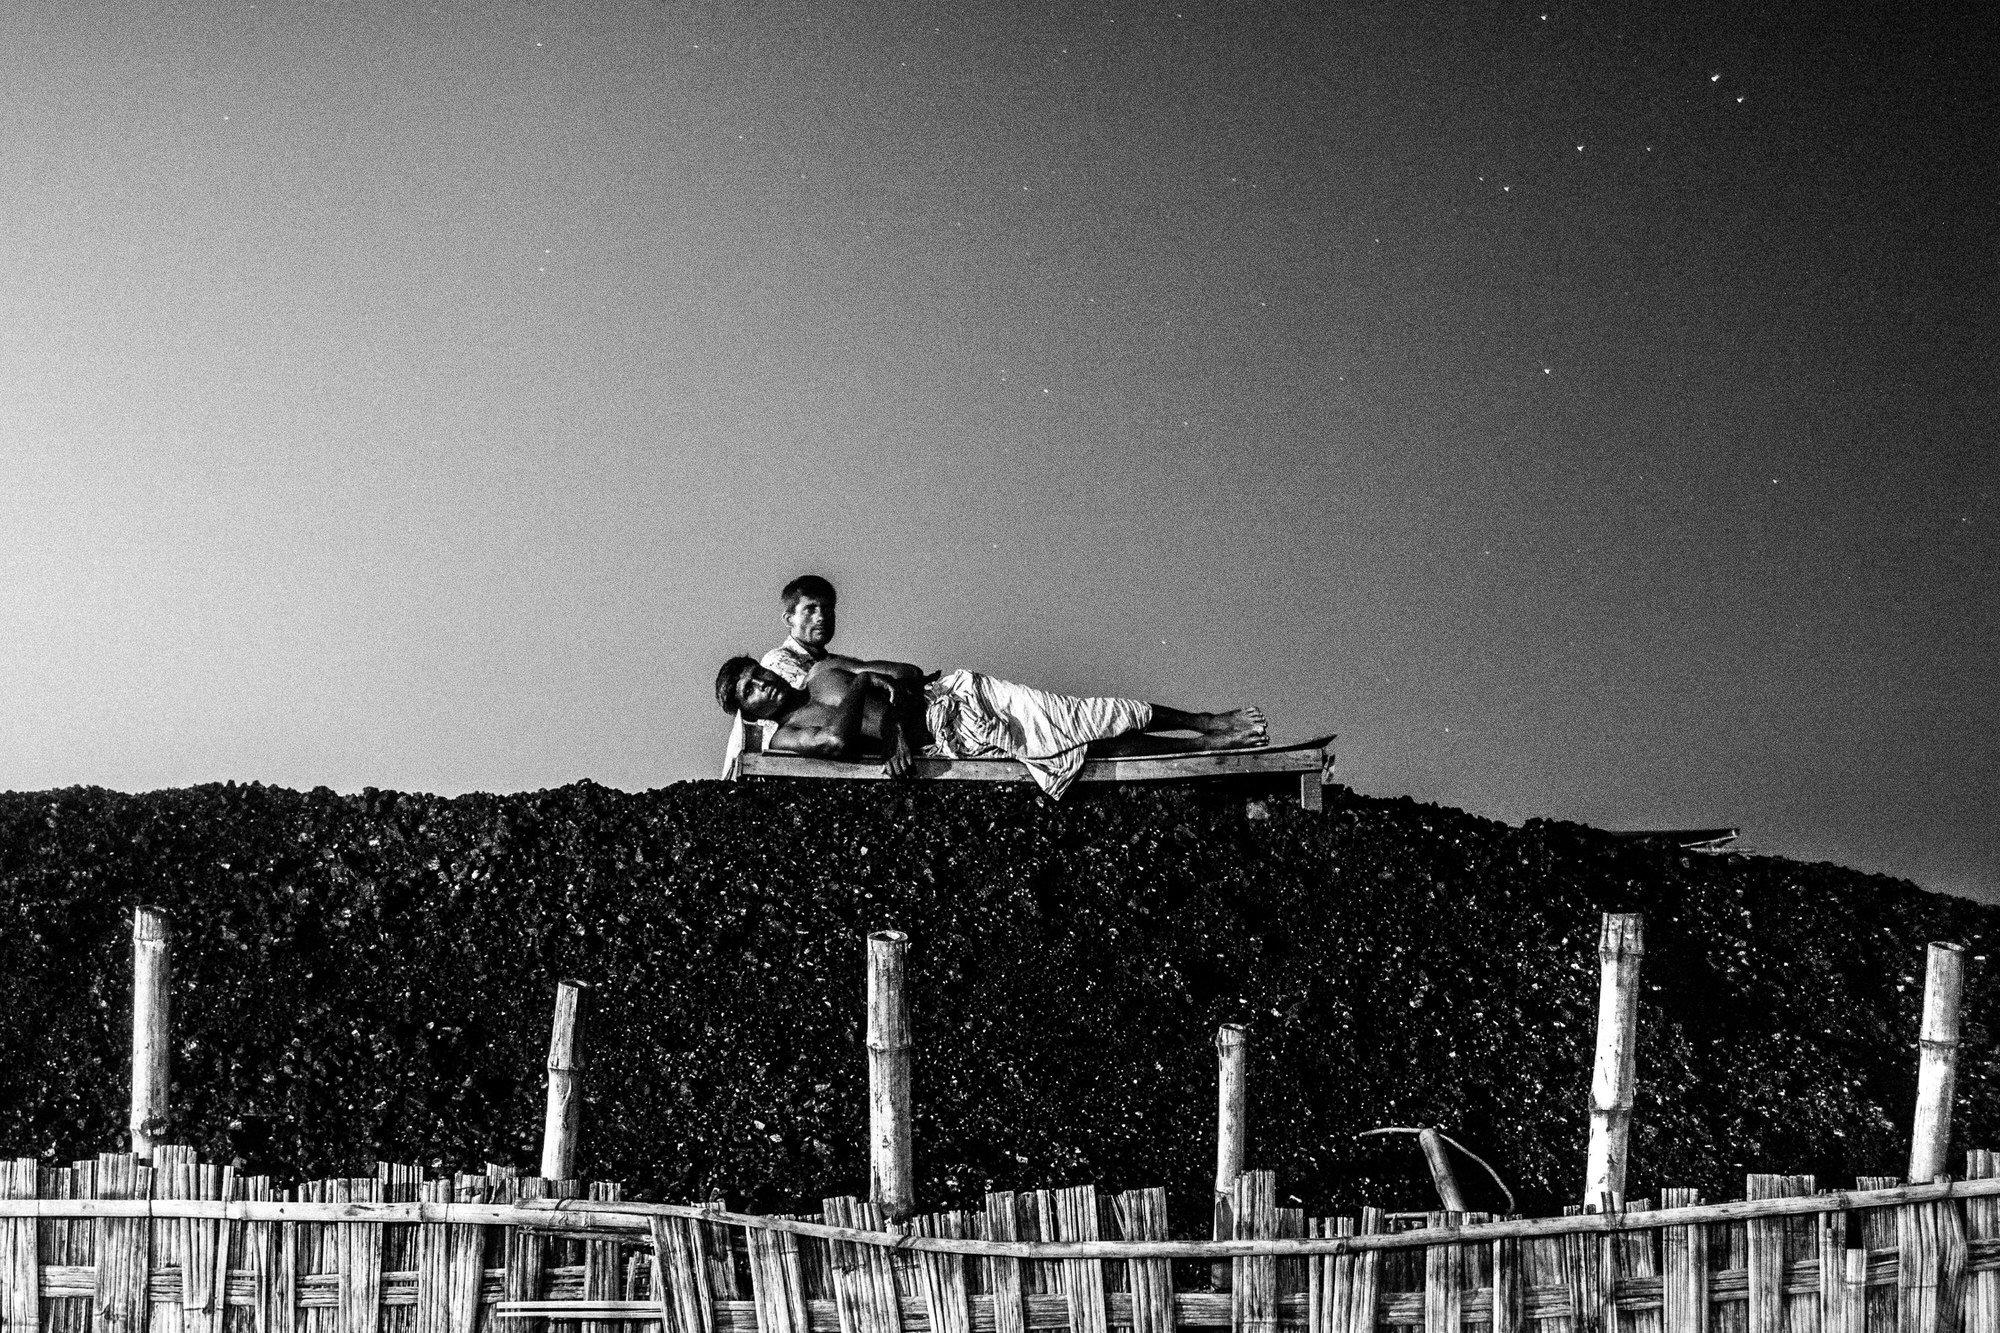 Black and White photography by Mushfiqur Rahman